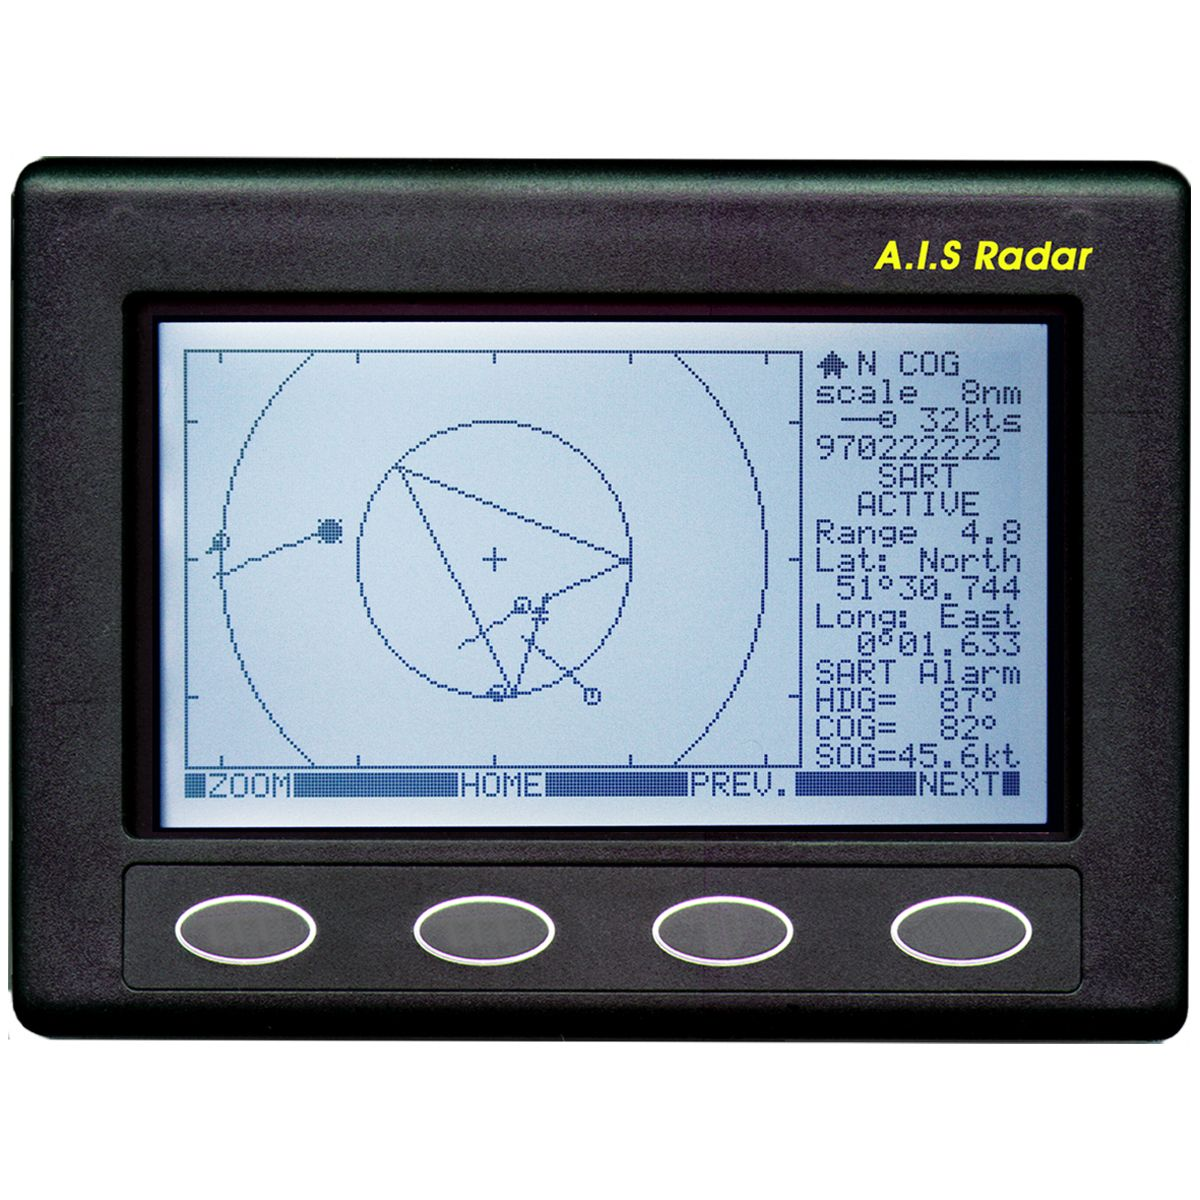 AIS SCART RADAR ais sart plotter nasa marine instruments nasa ais engine wiring diagram at reclaimingppi.co